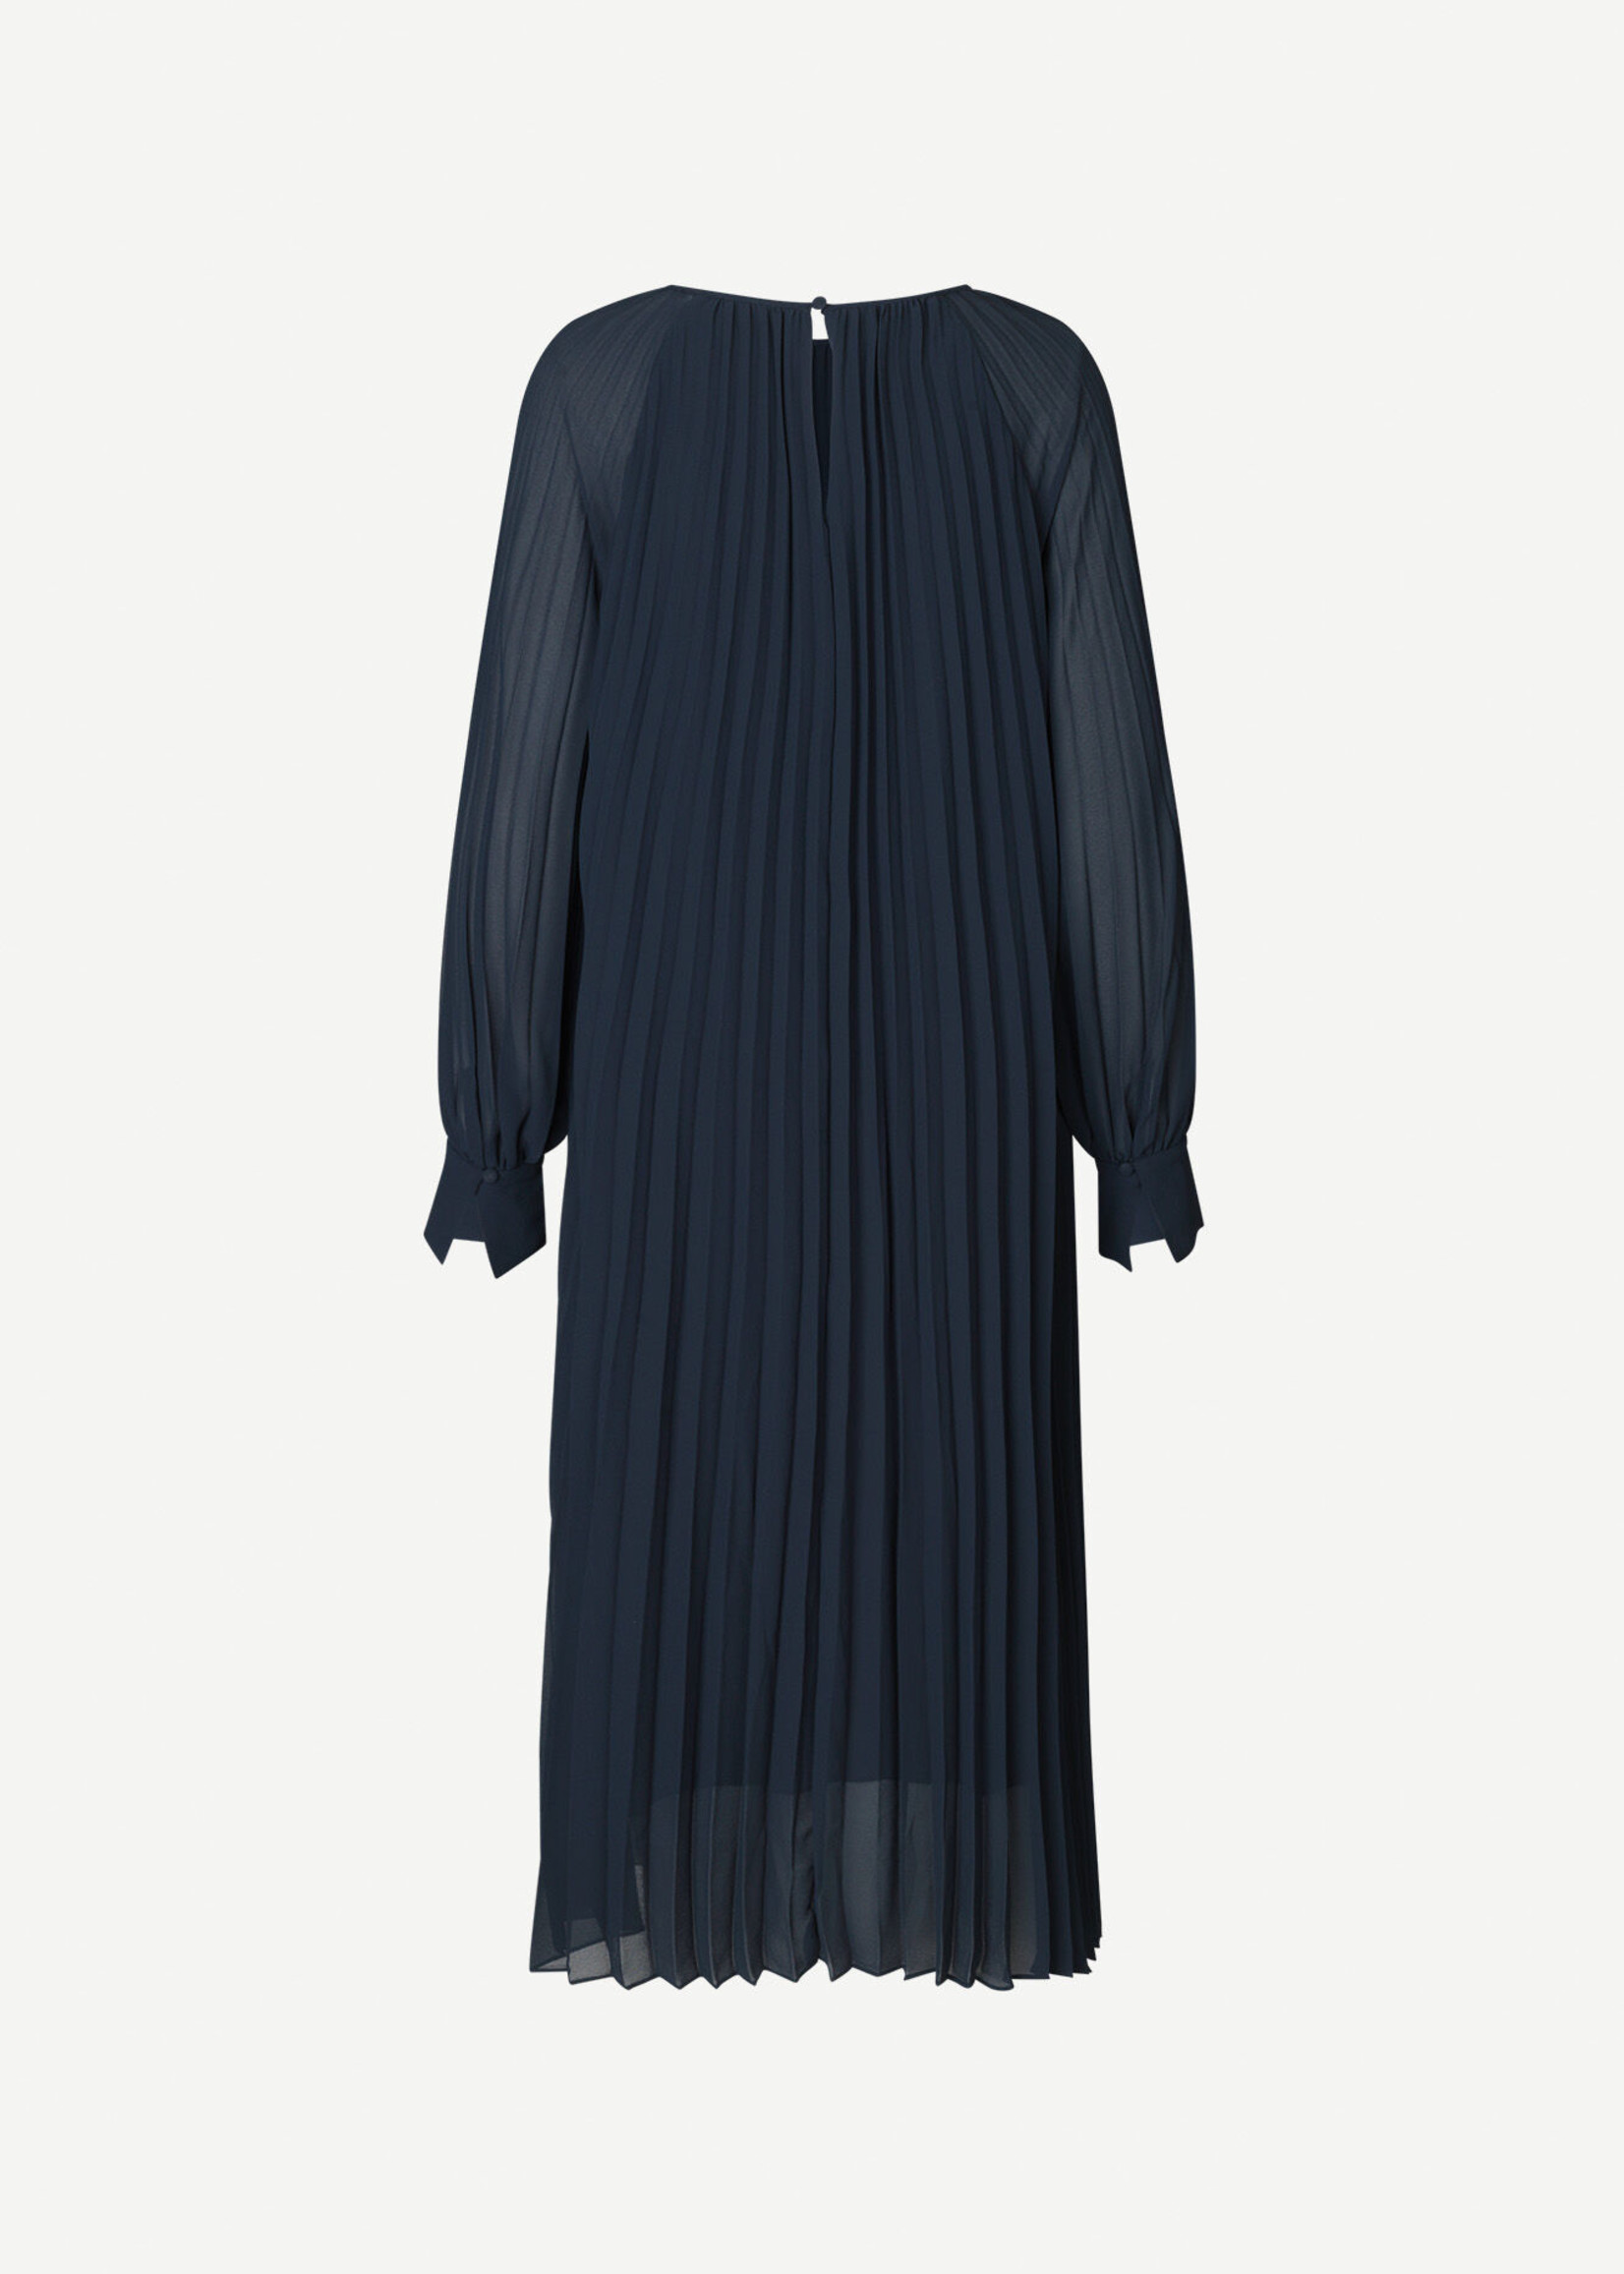 Samsoe & Samsoe Annmari Dress 6621